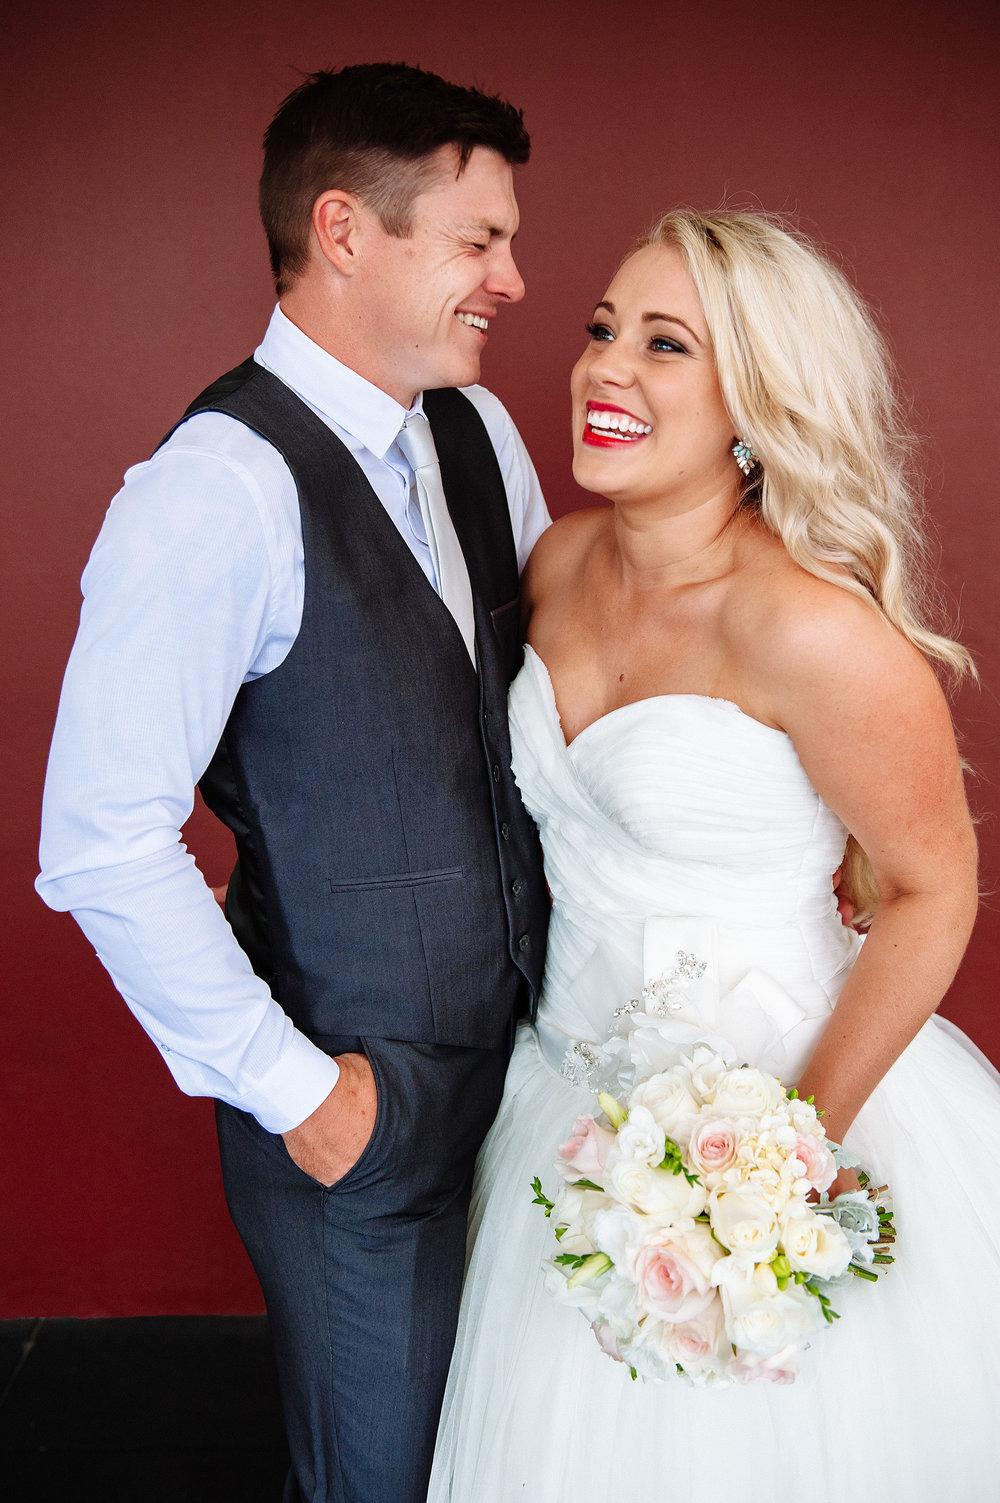 Marryme_wedding_photography_dorrigo_bellingen_photographer_27.jpg